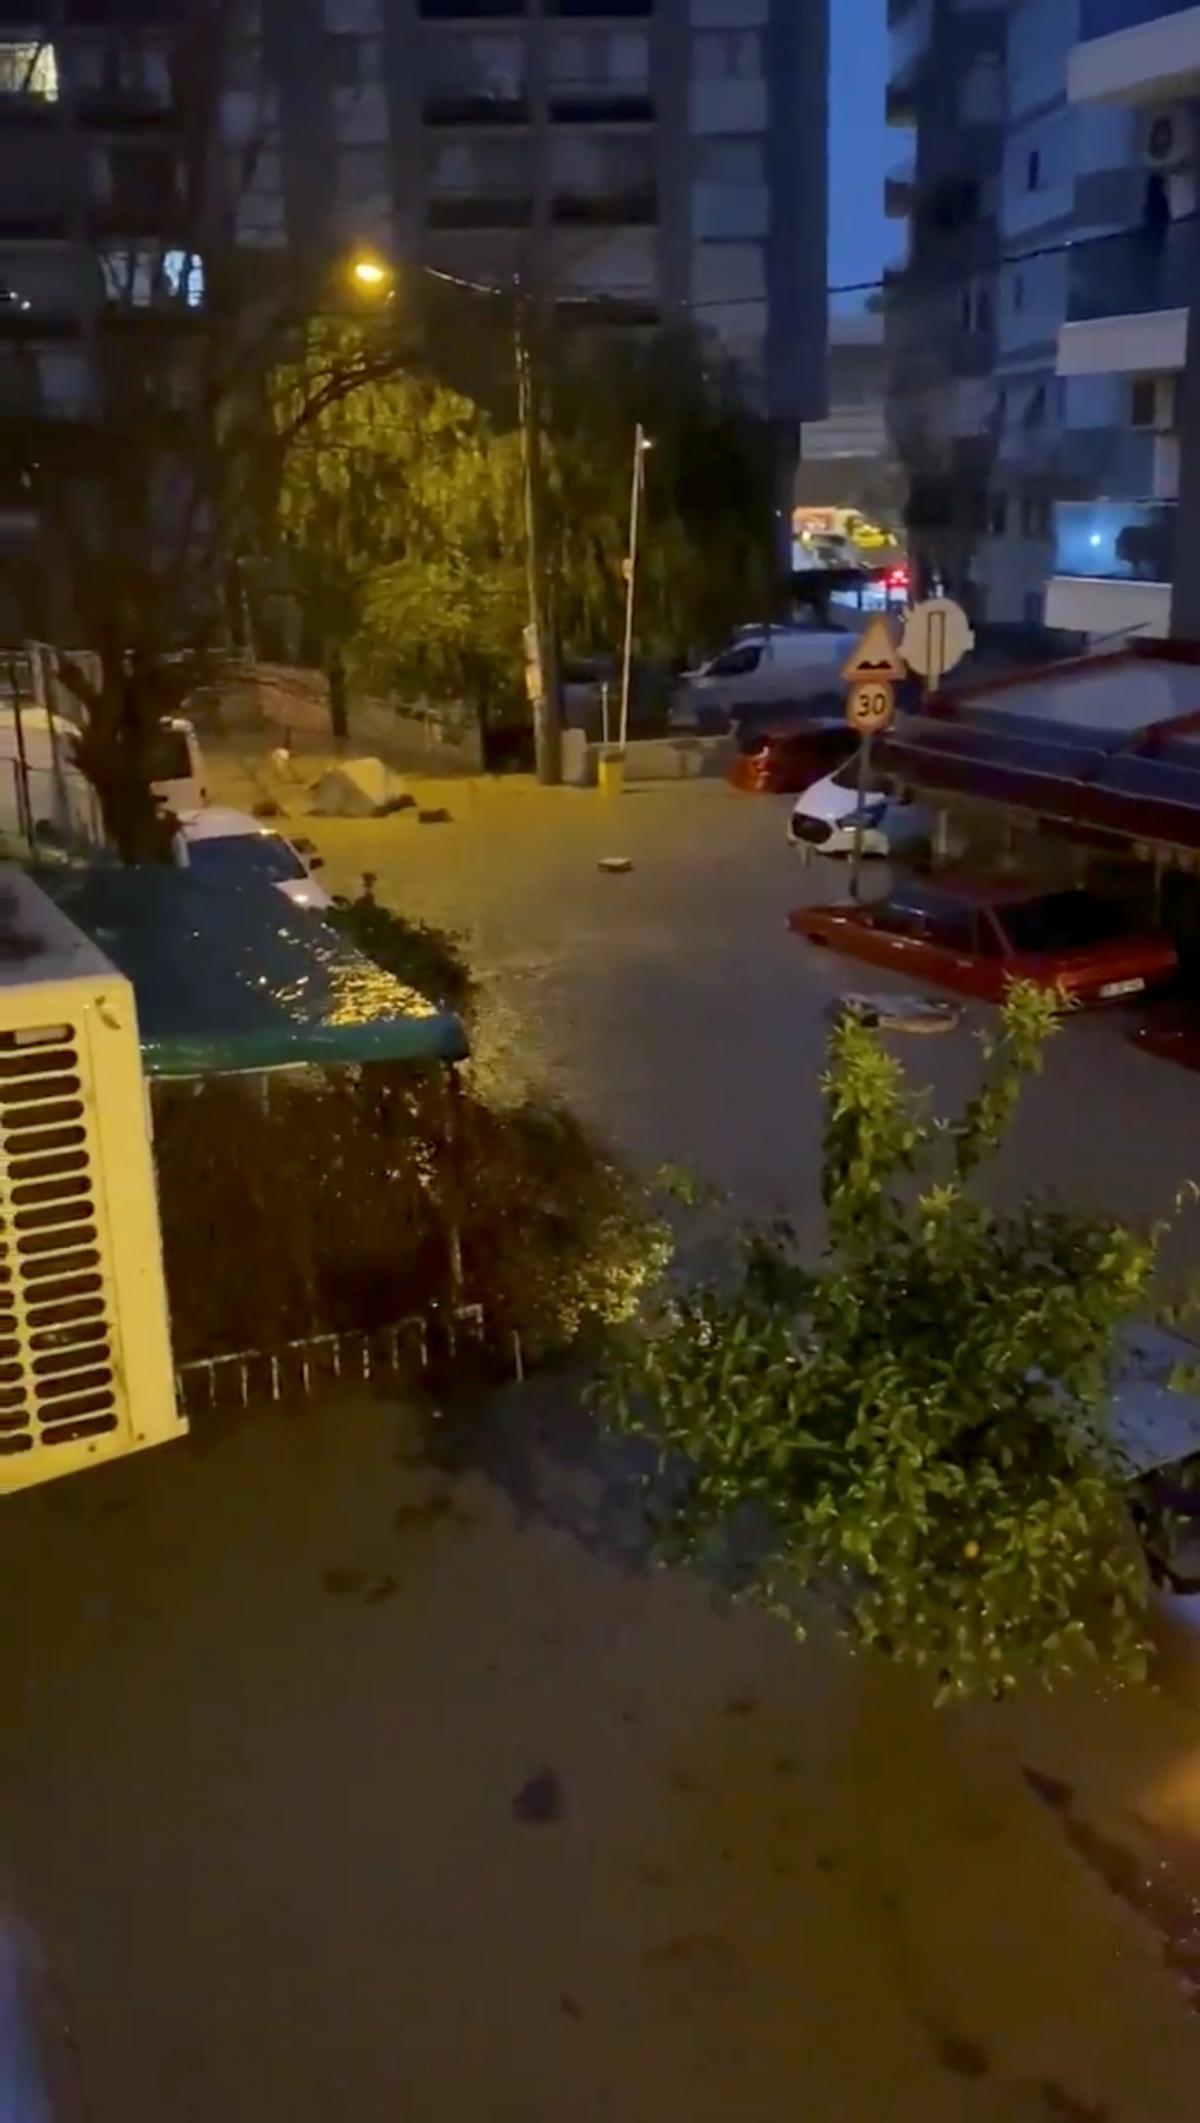 Ливни затопили турецкий город / Фото REUTERS